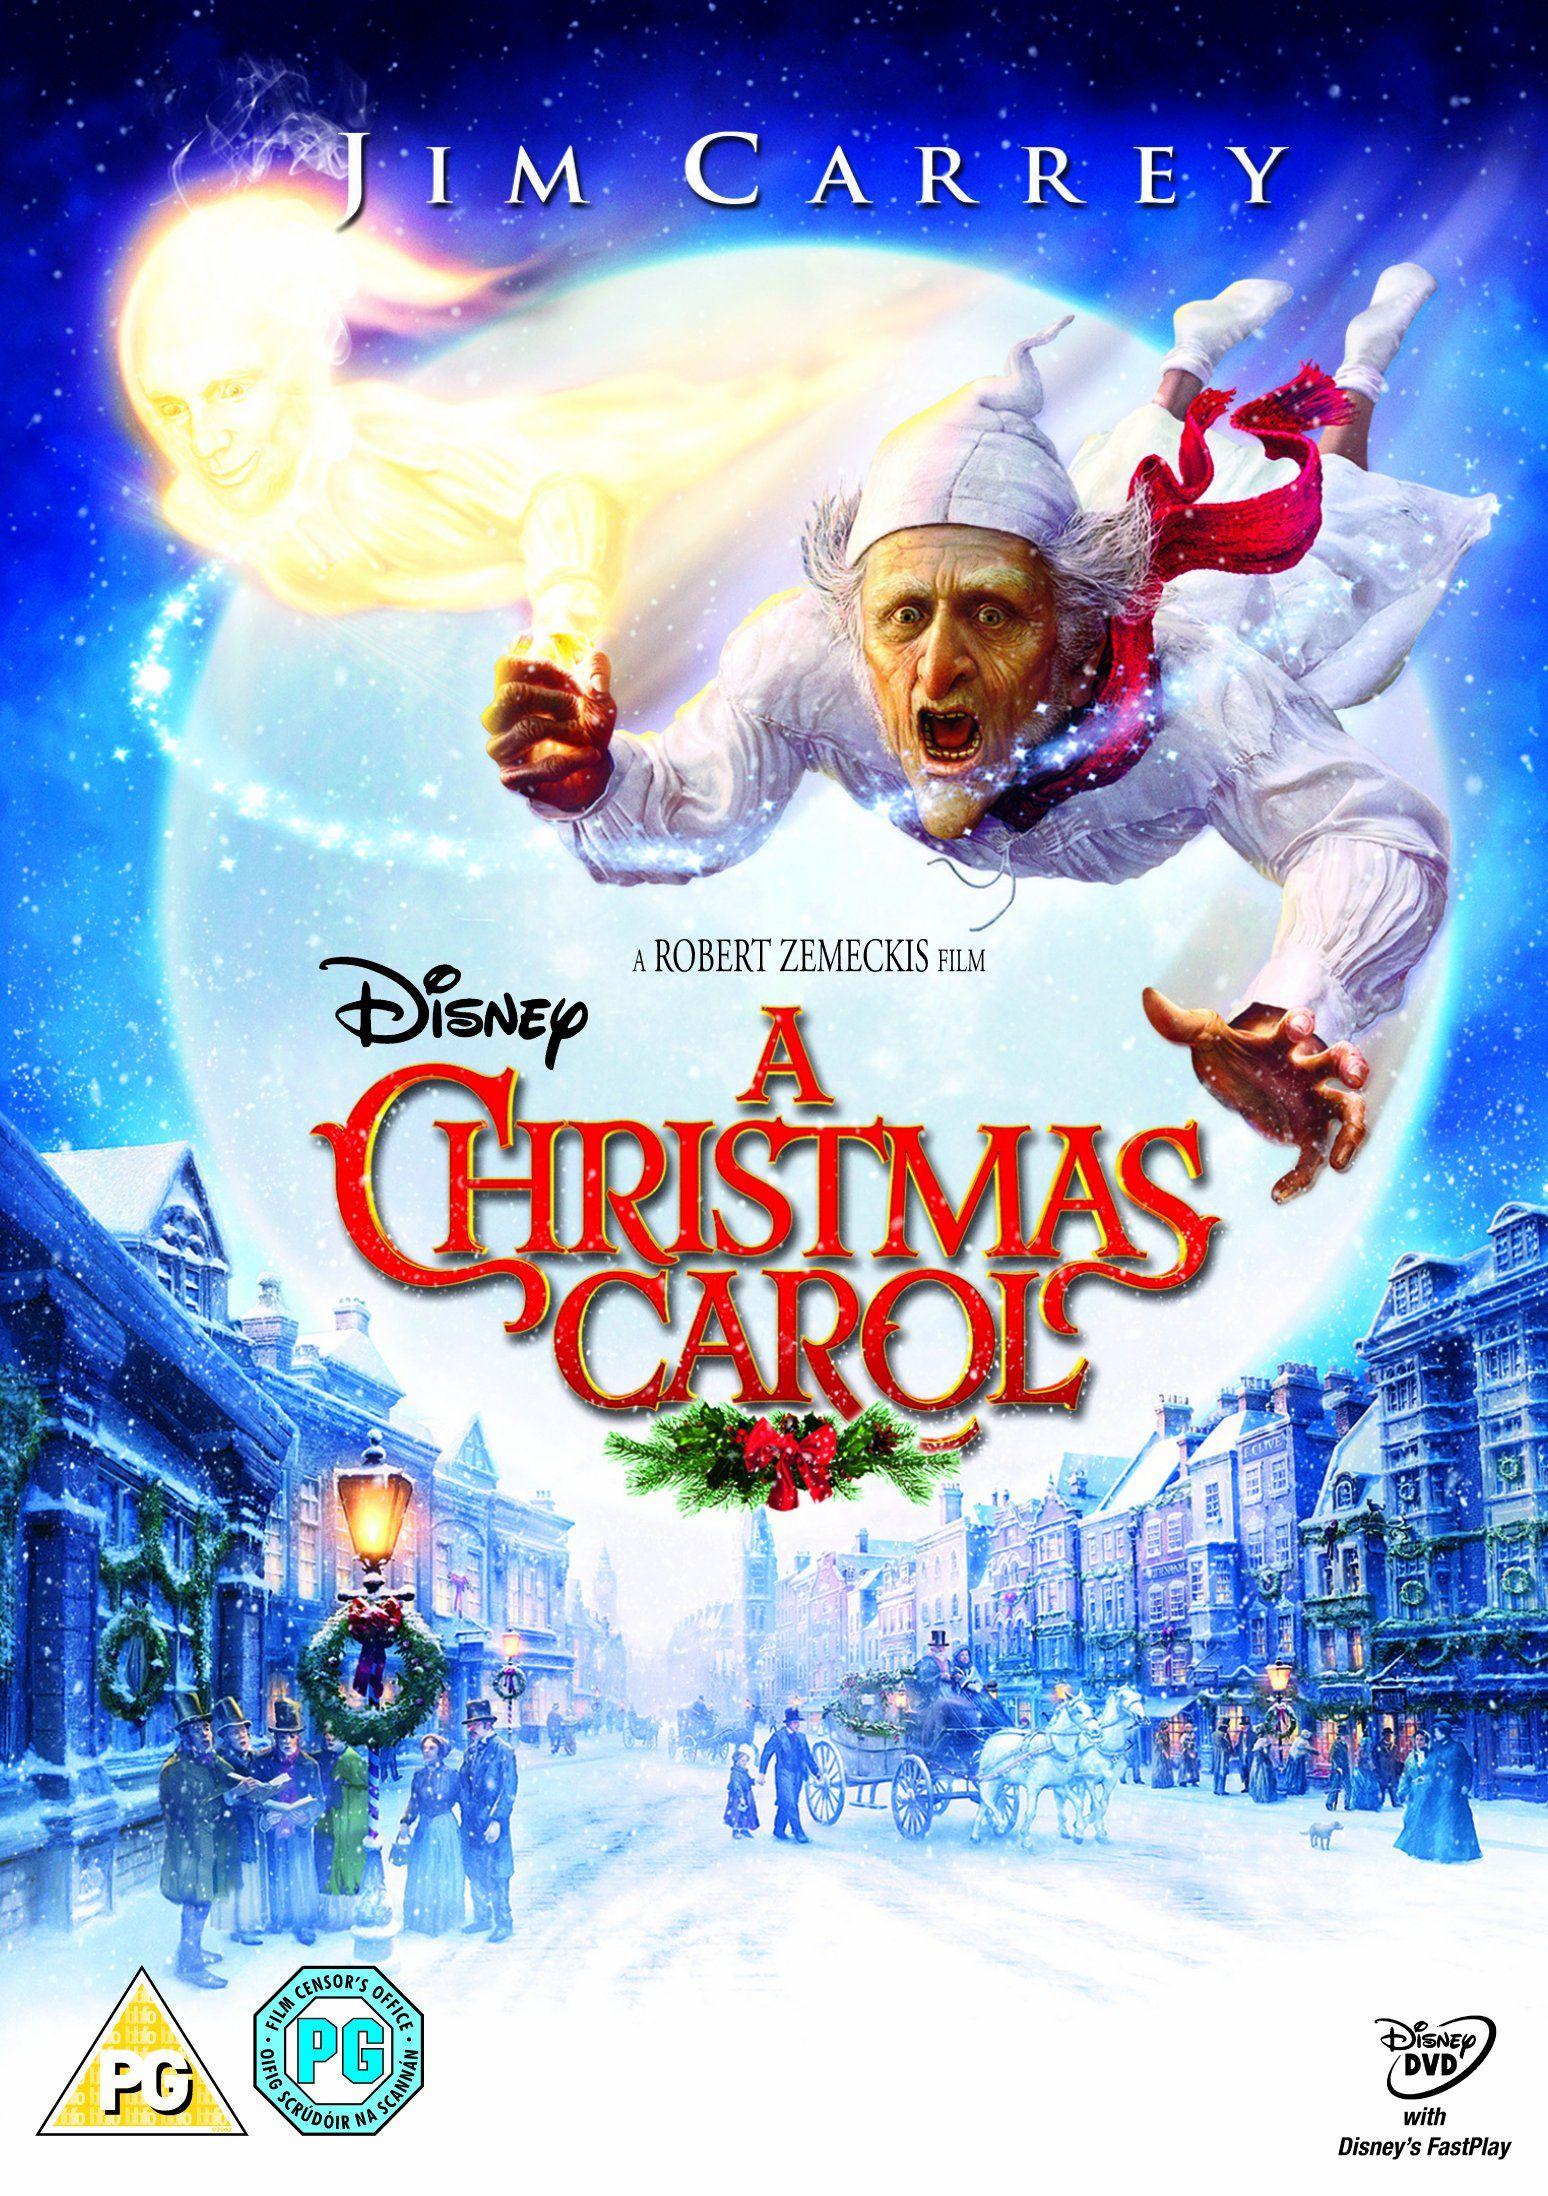 A Christmas Carol Dvd Amazon Co Uk Jim Carrey Steve Valentine Daryl Sabara Sage Ryan Amber Gain Christmas Carol Disney Movies Anywhere Christmas Movies